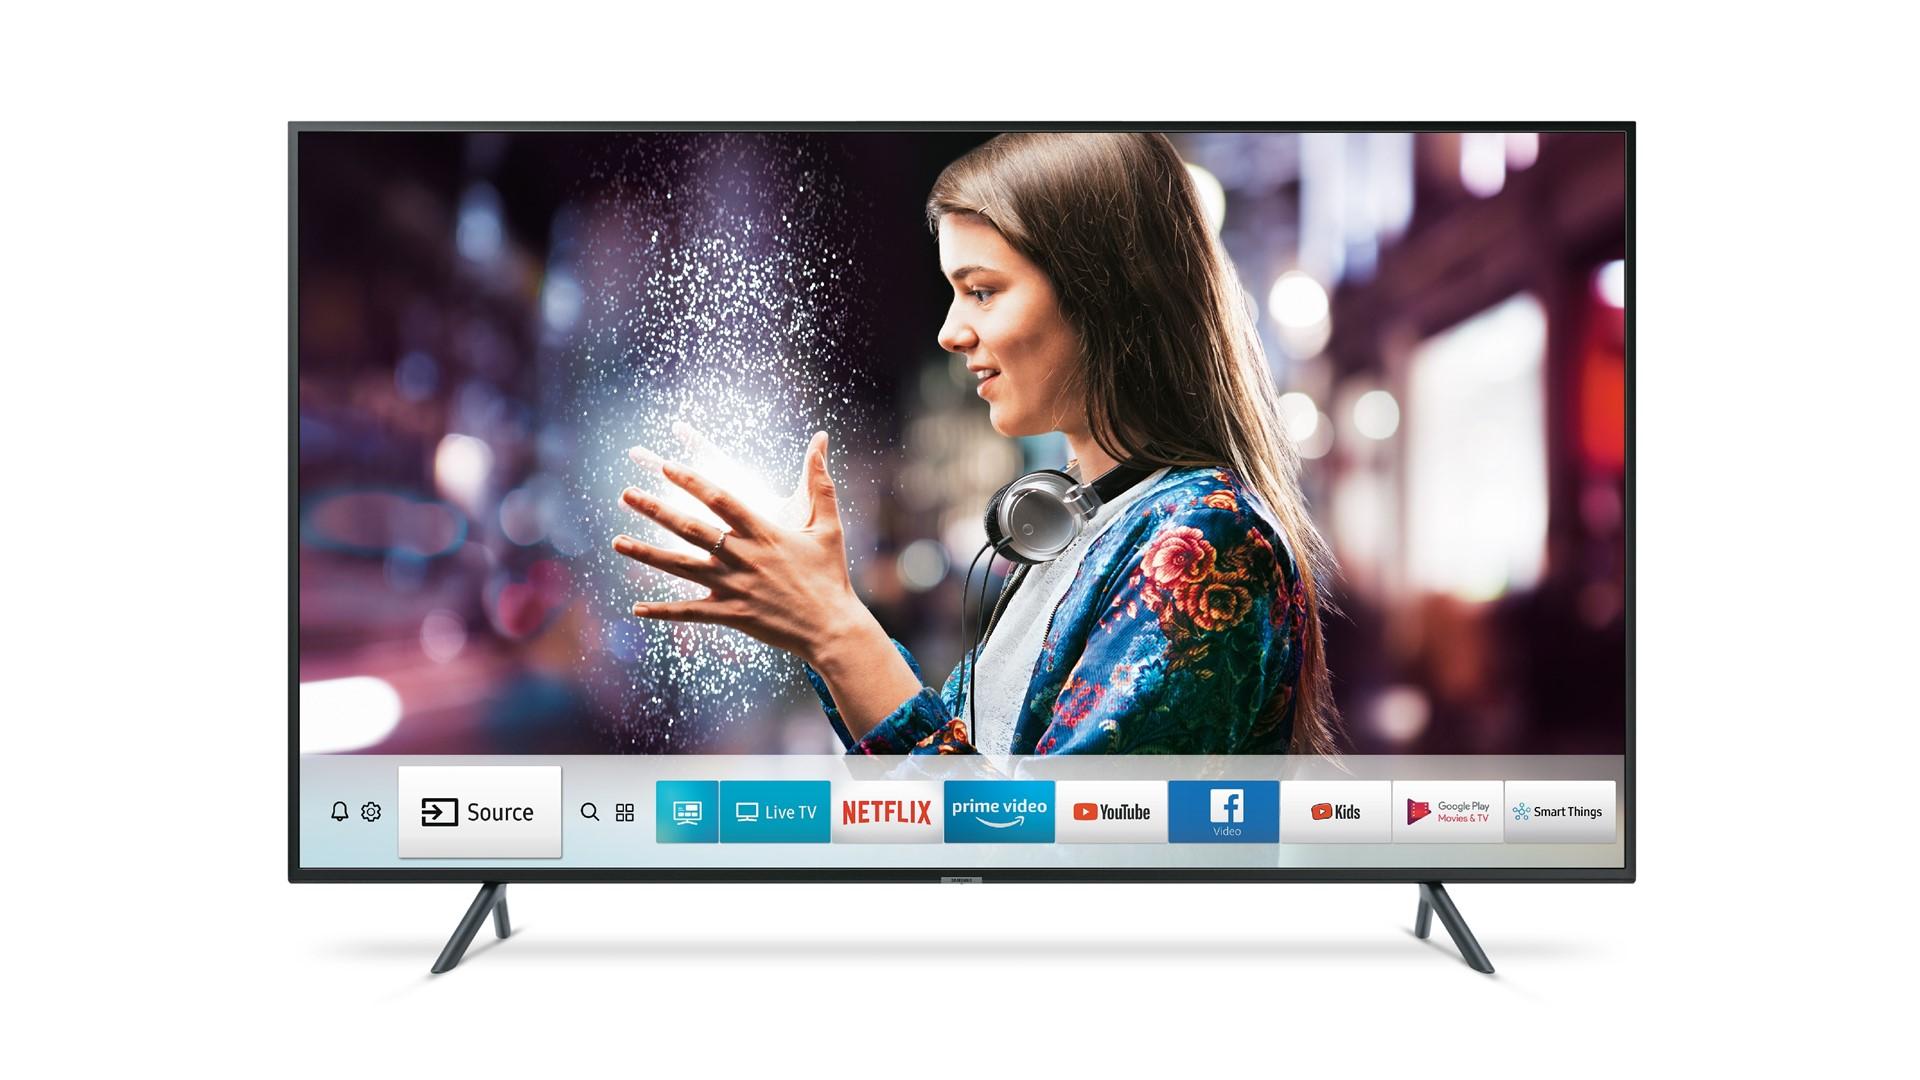 Samsung announces refreshed Smart TV range in India | TechRadar